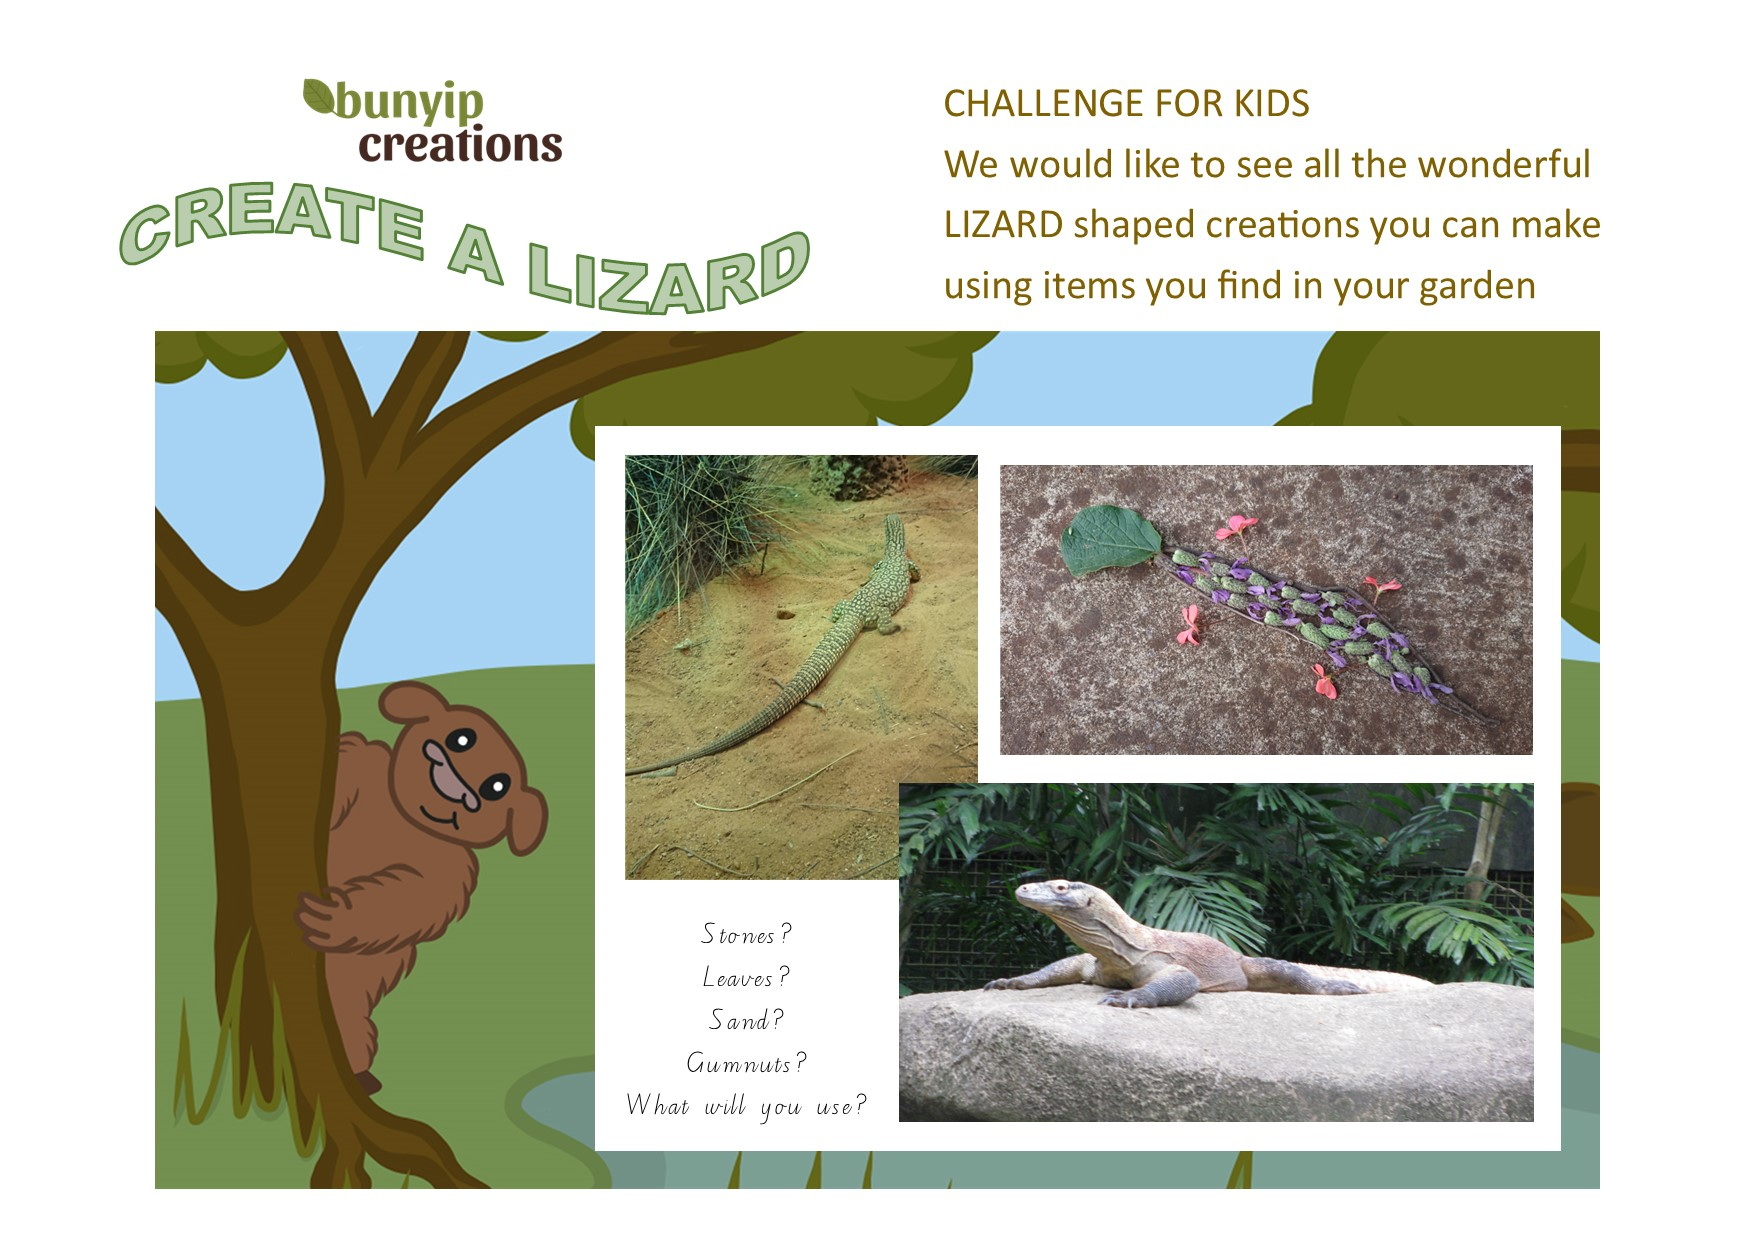 CREATE A LIZARD CHALLENGE